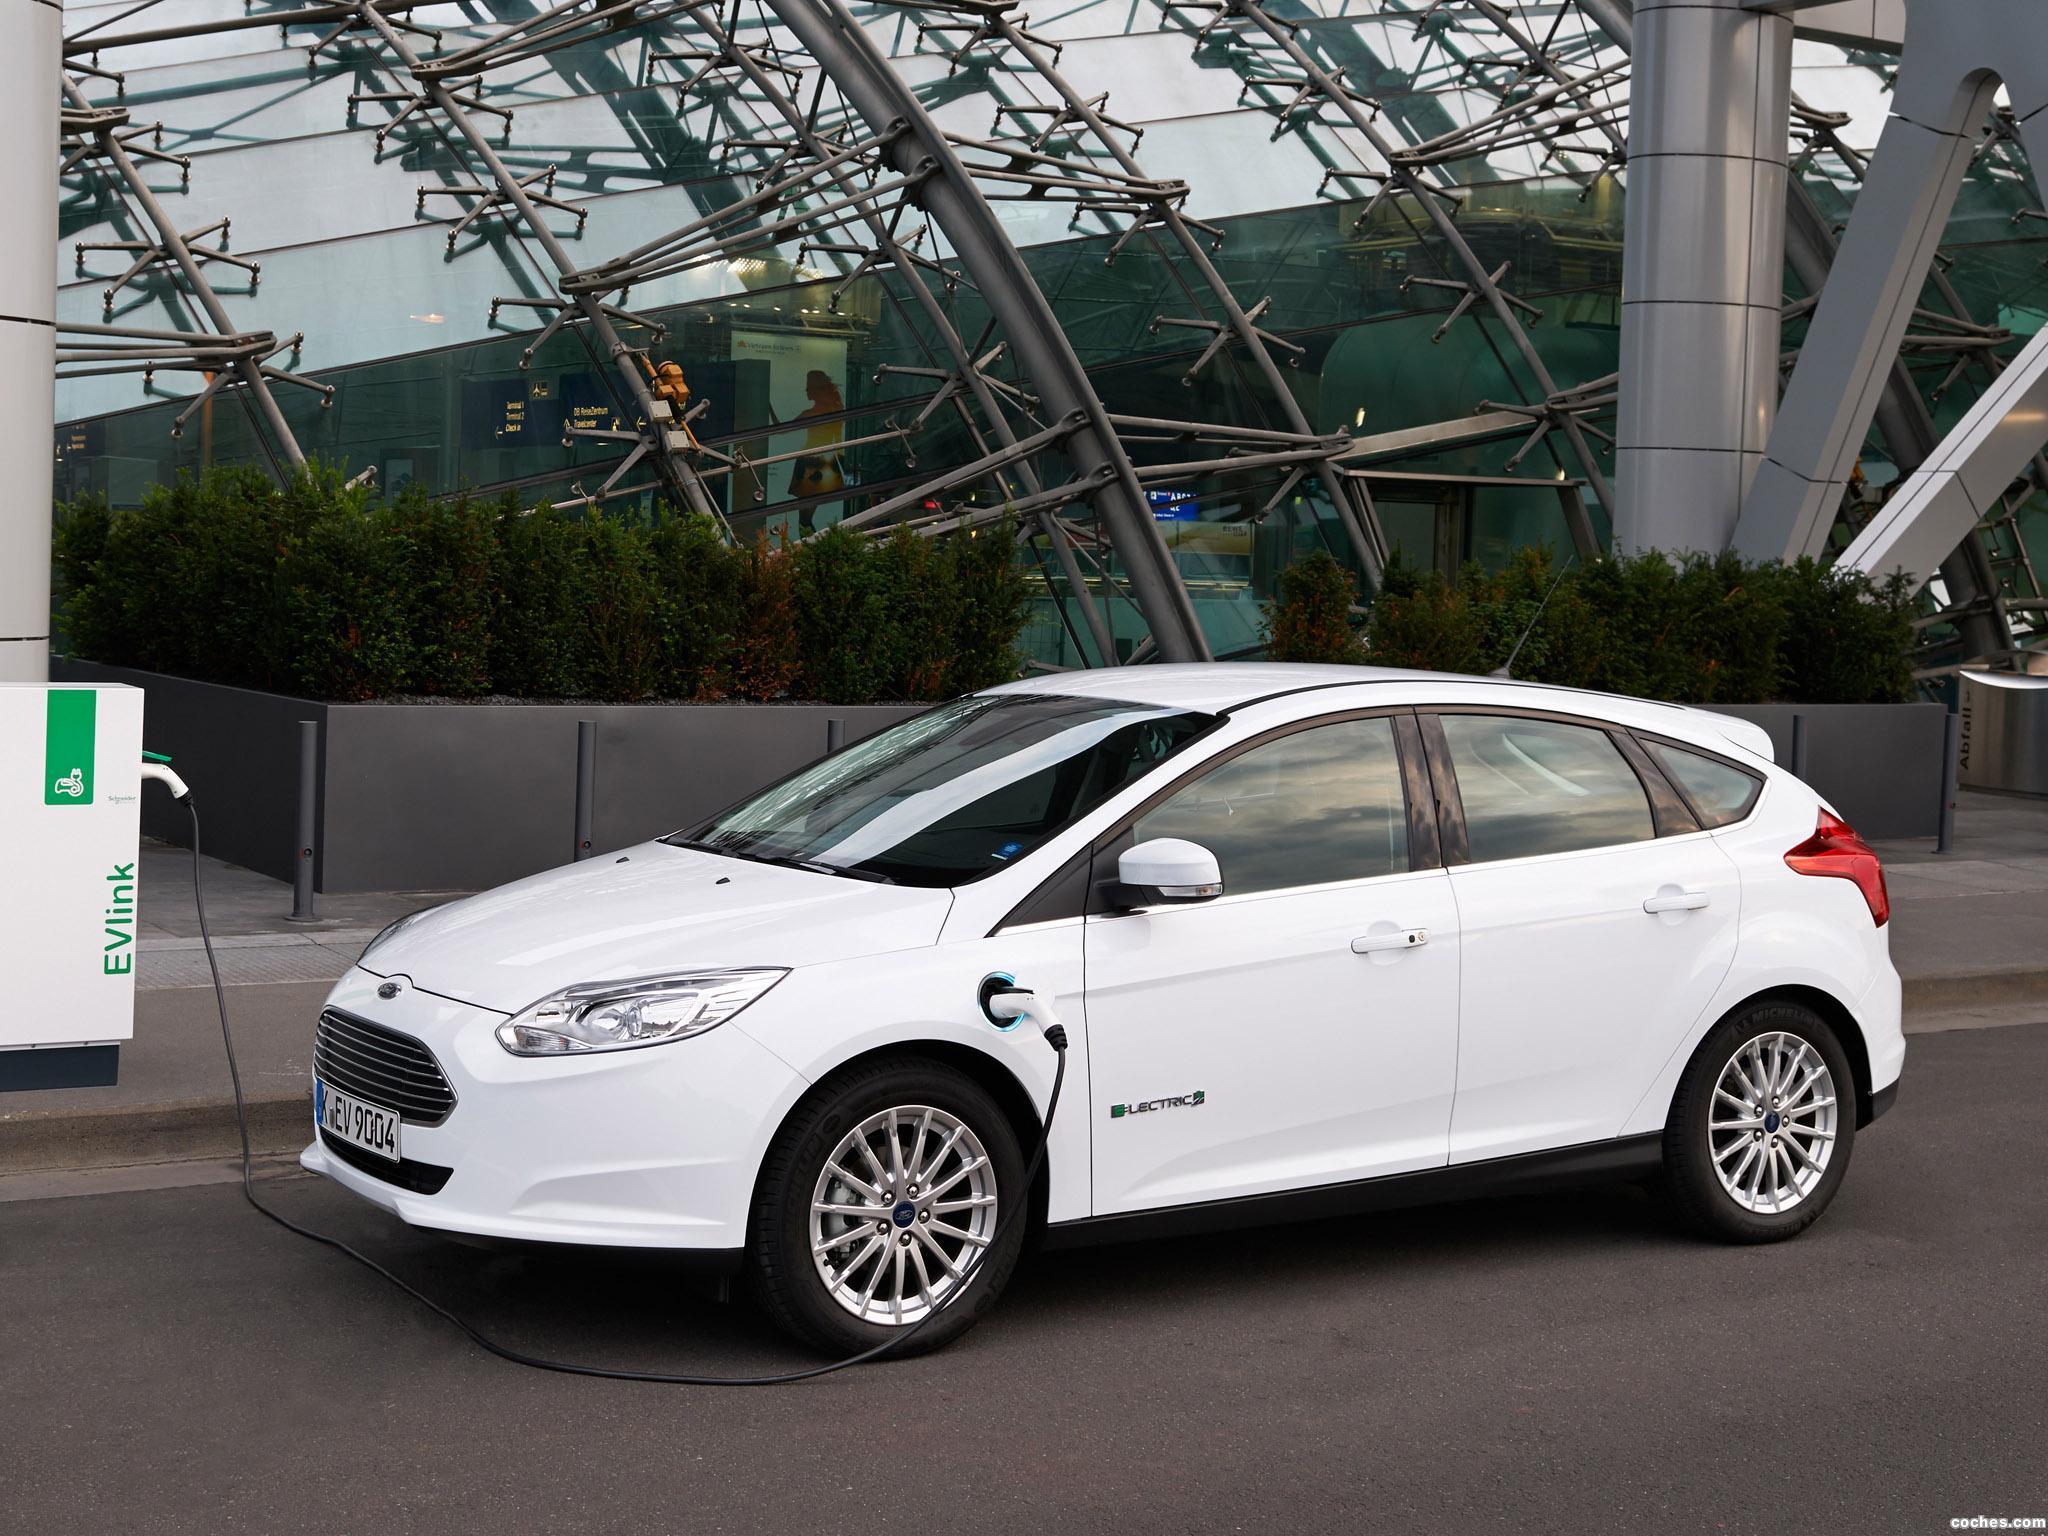 Foto 0 de Ford Focus Electric 5 puertas 2013